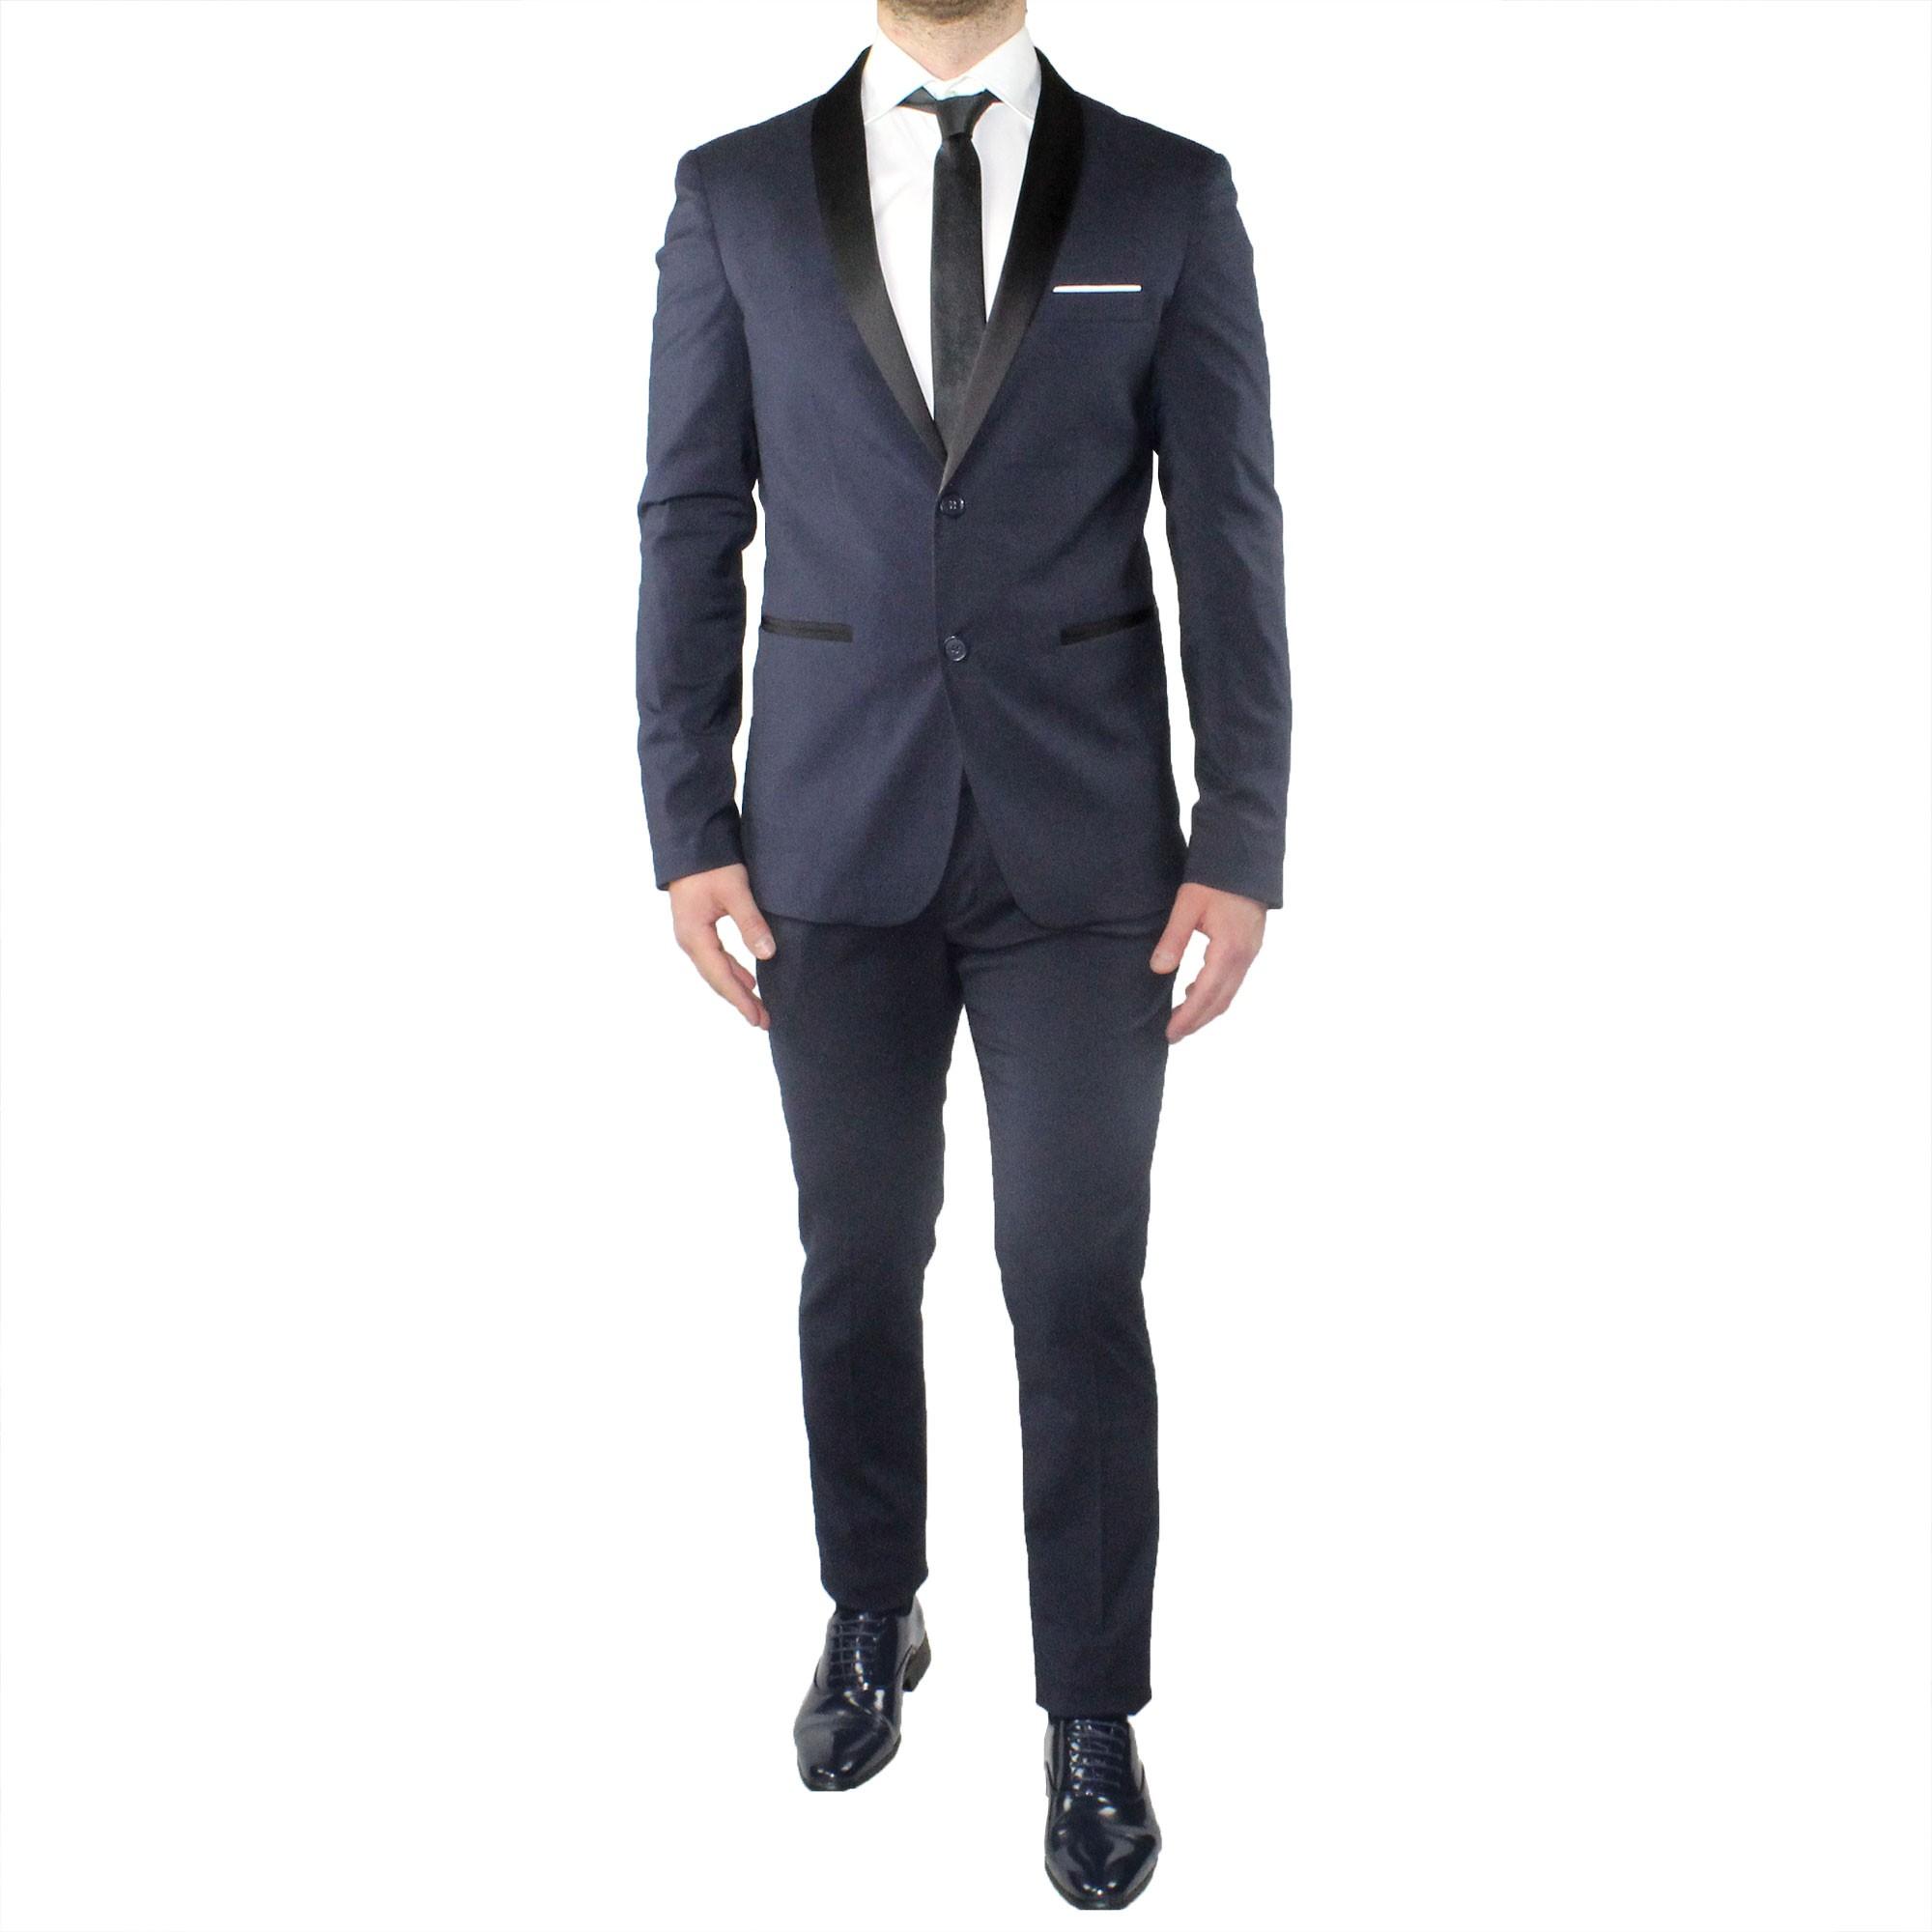 Abito-Uomo-Smoking-Elegante-Vestito-Completo-Estivo-Cerimonia-Sartoriale-Slim miniatura 5